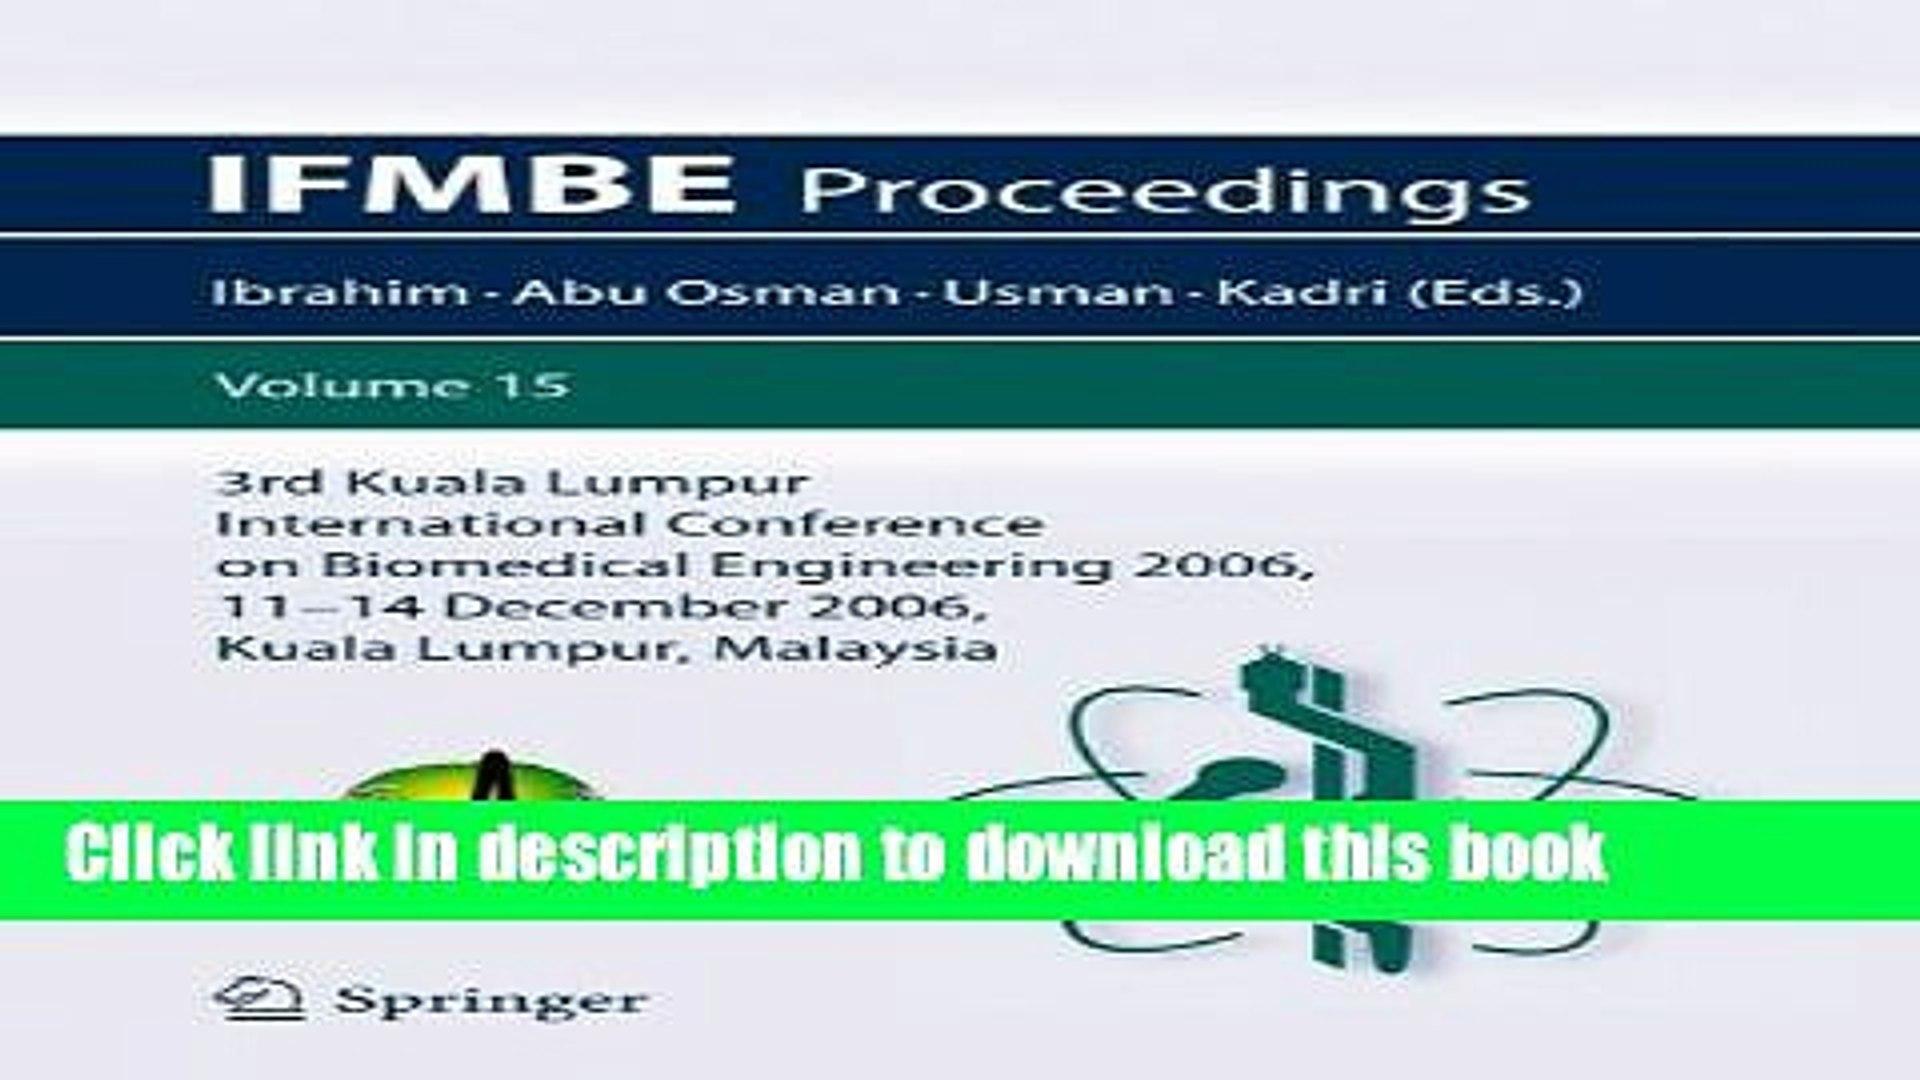 Books 3rd Kuala Lumpur International Conference on Biomedical Engineering 2006: Biomed 2006, 11-14